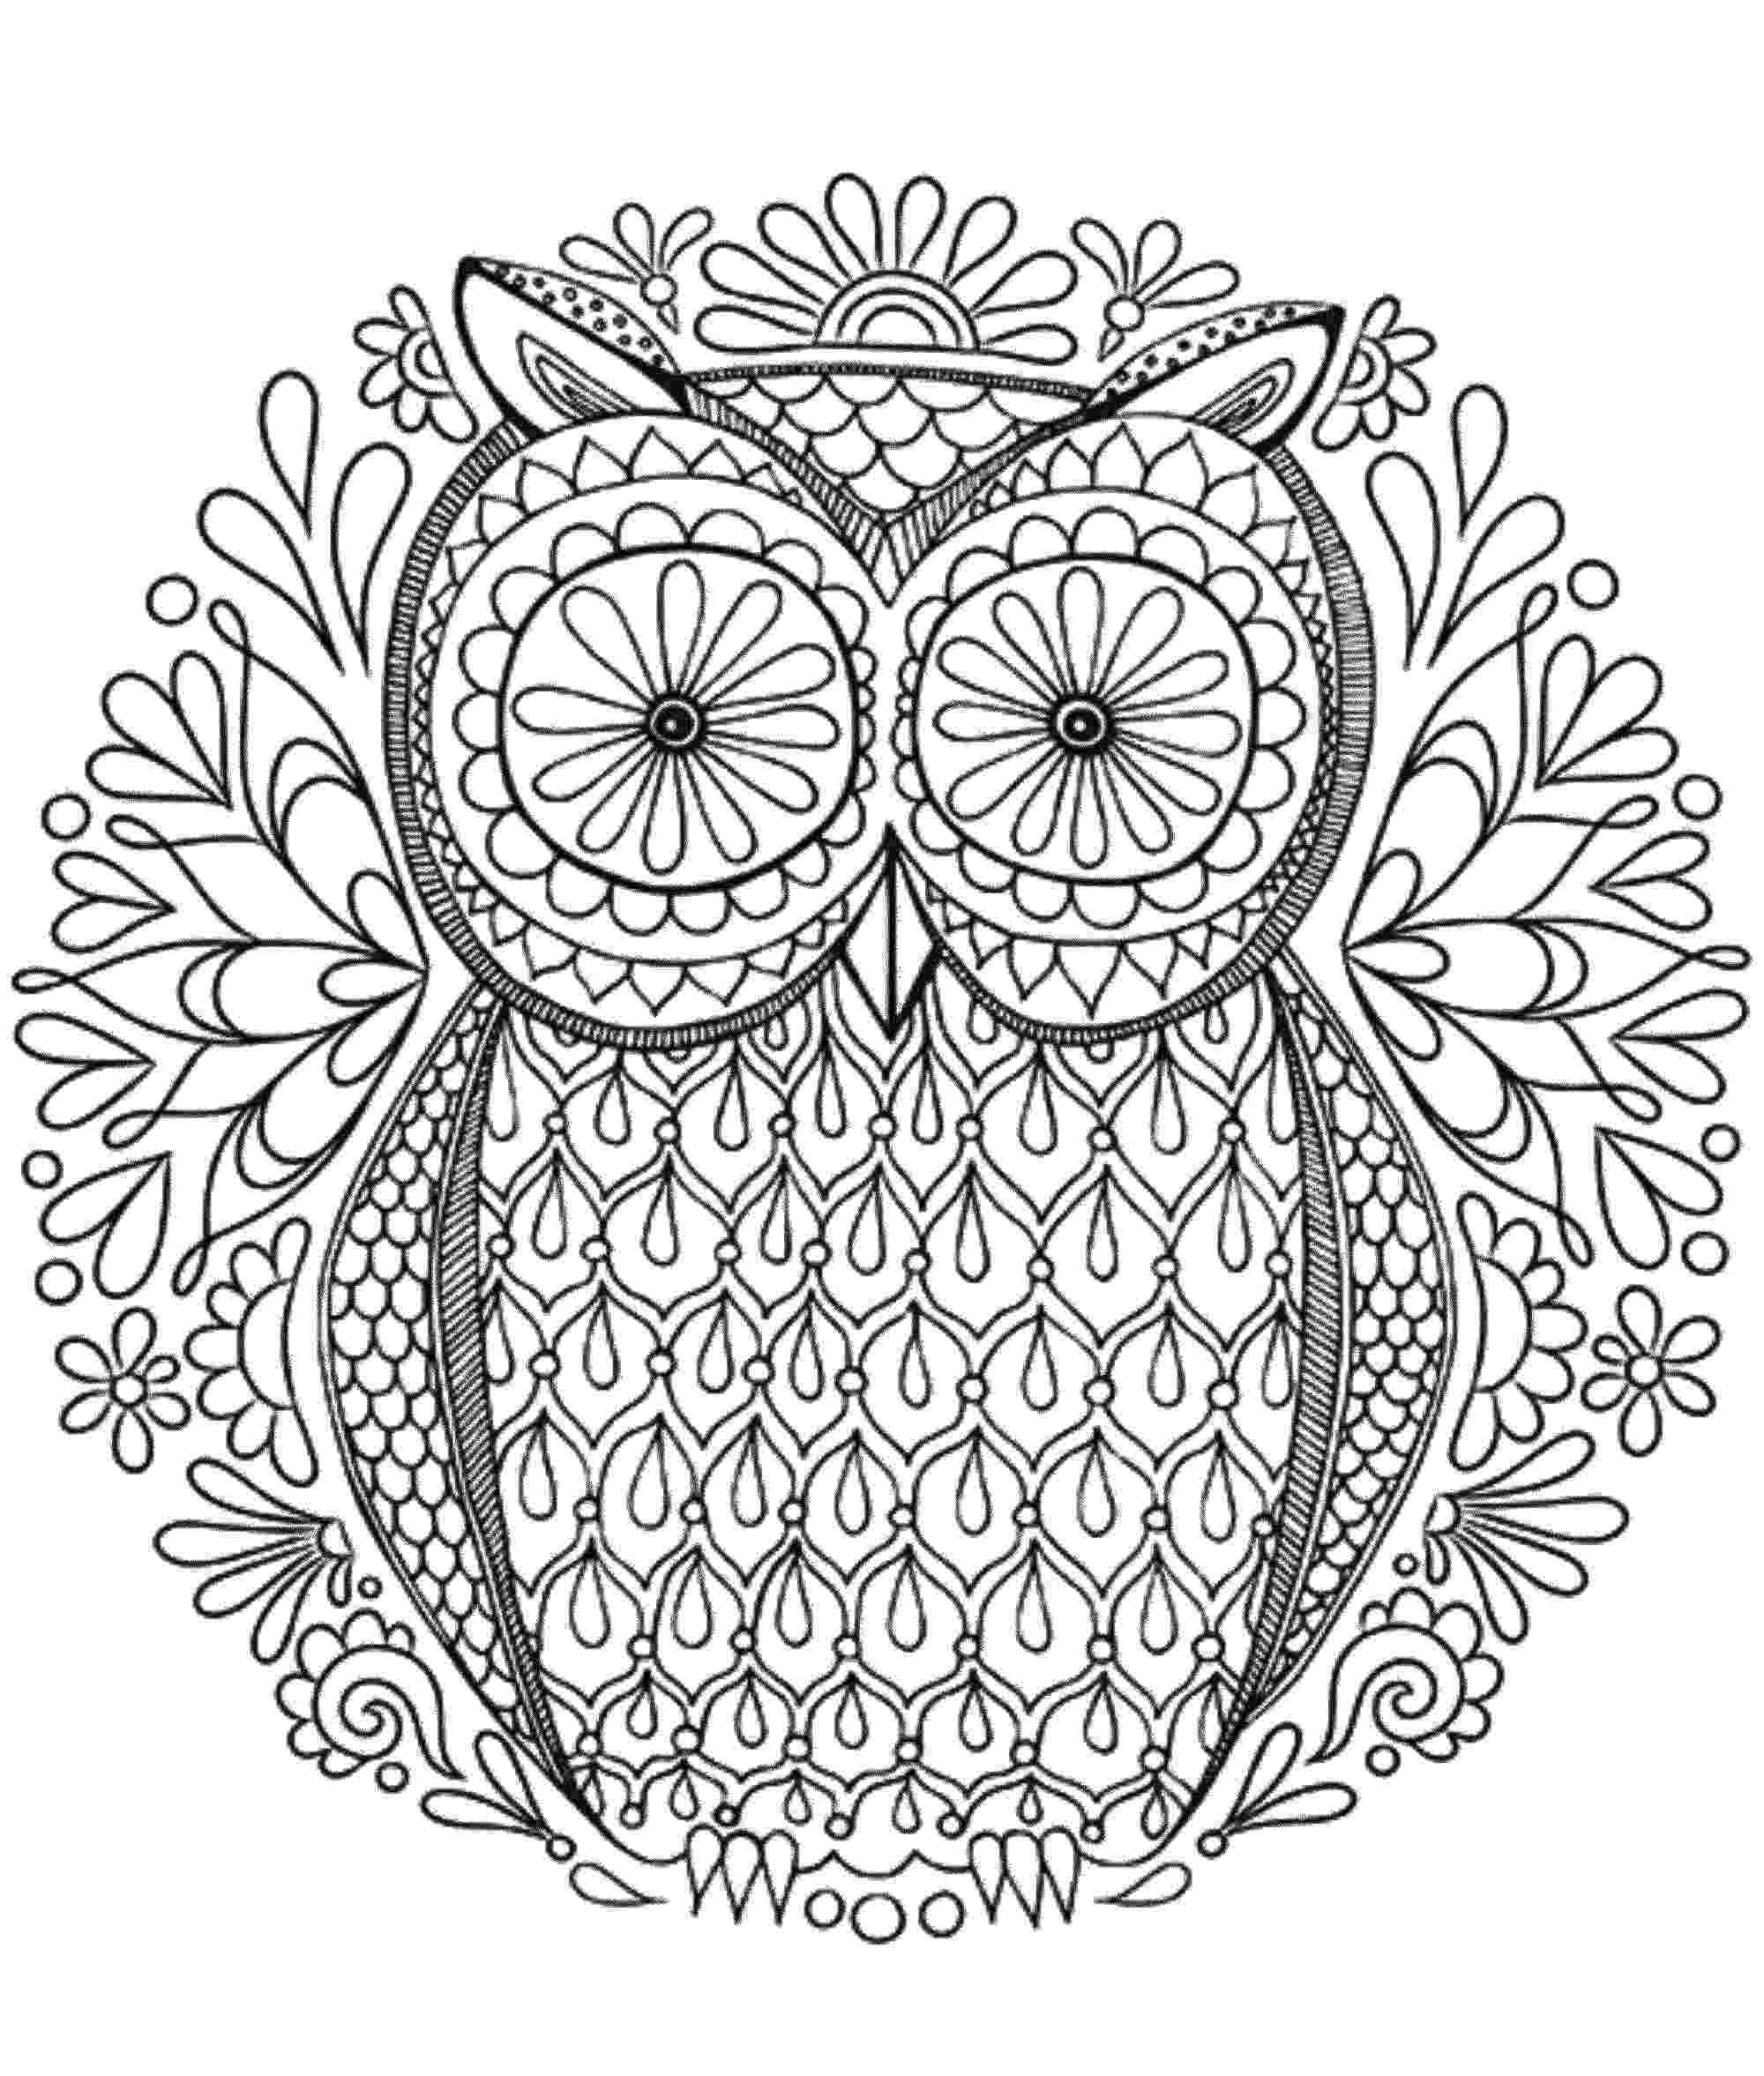 coloring mandalas for adults mandala to download in pdf 6 malas adult coloring pages coloring adults mandalas for